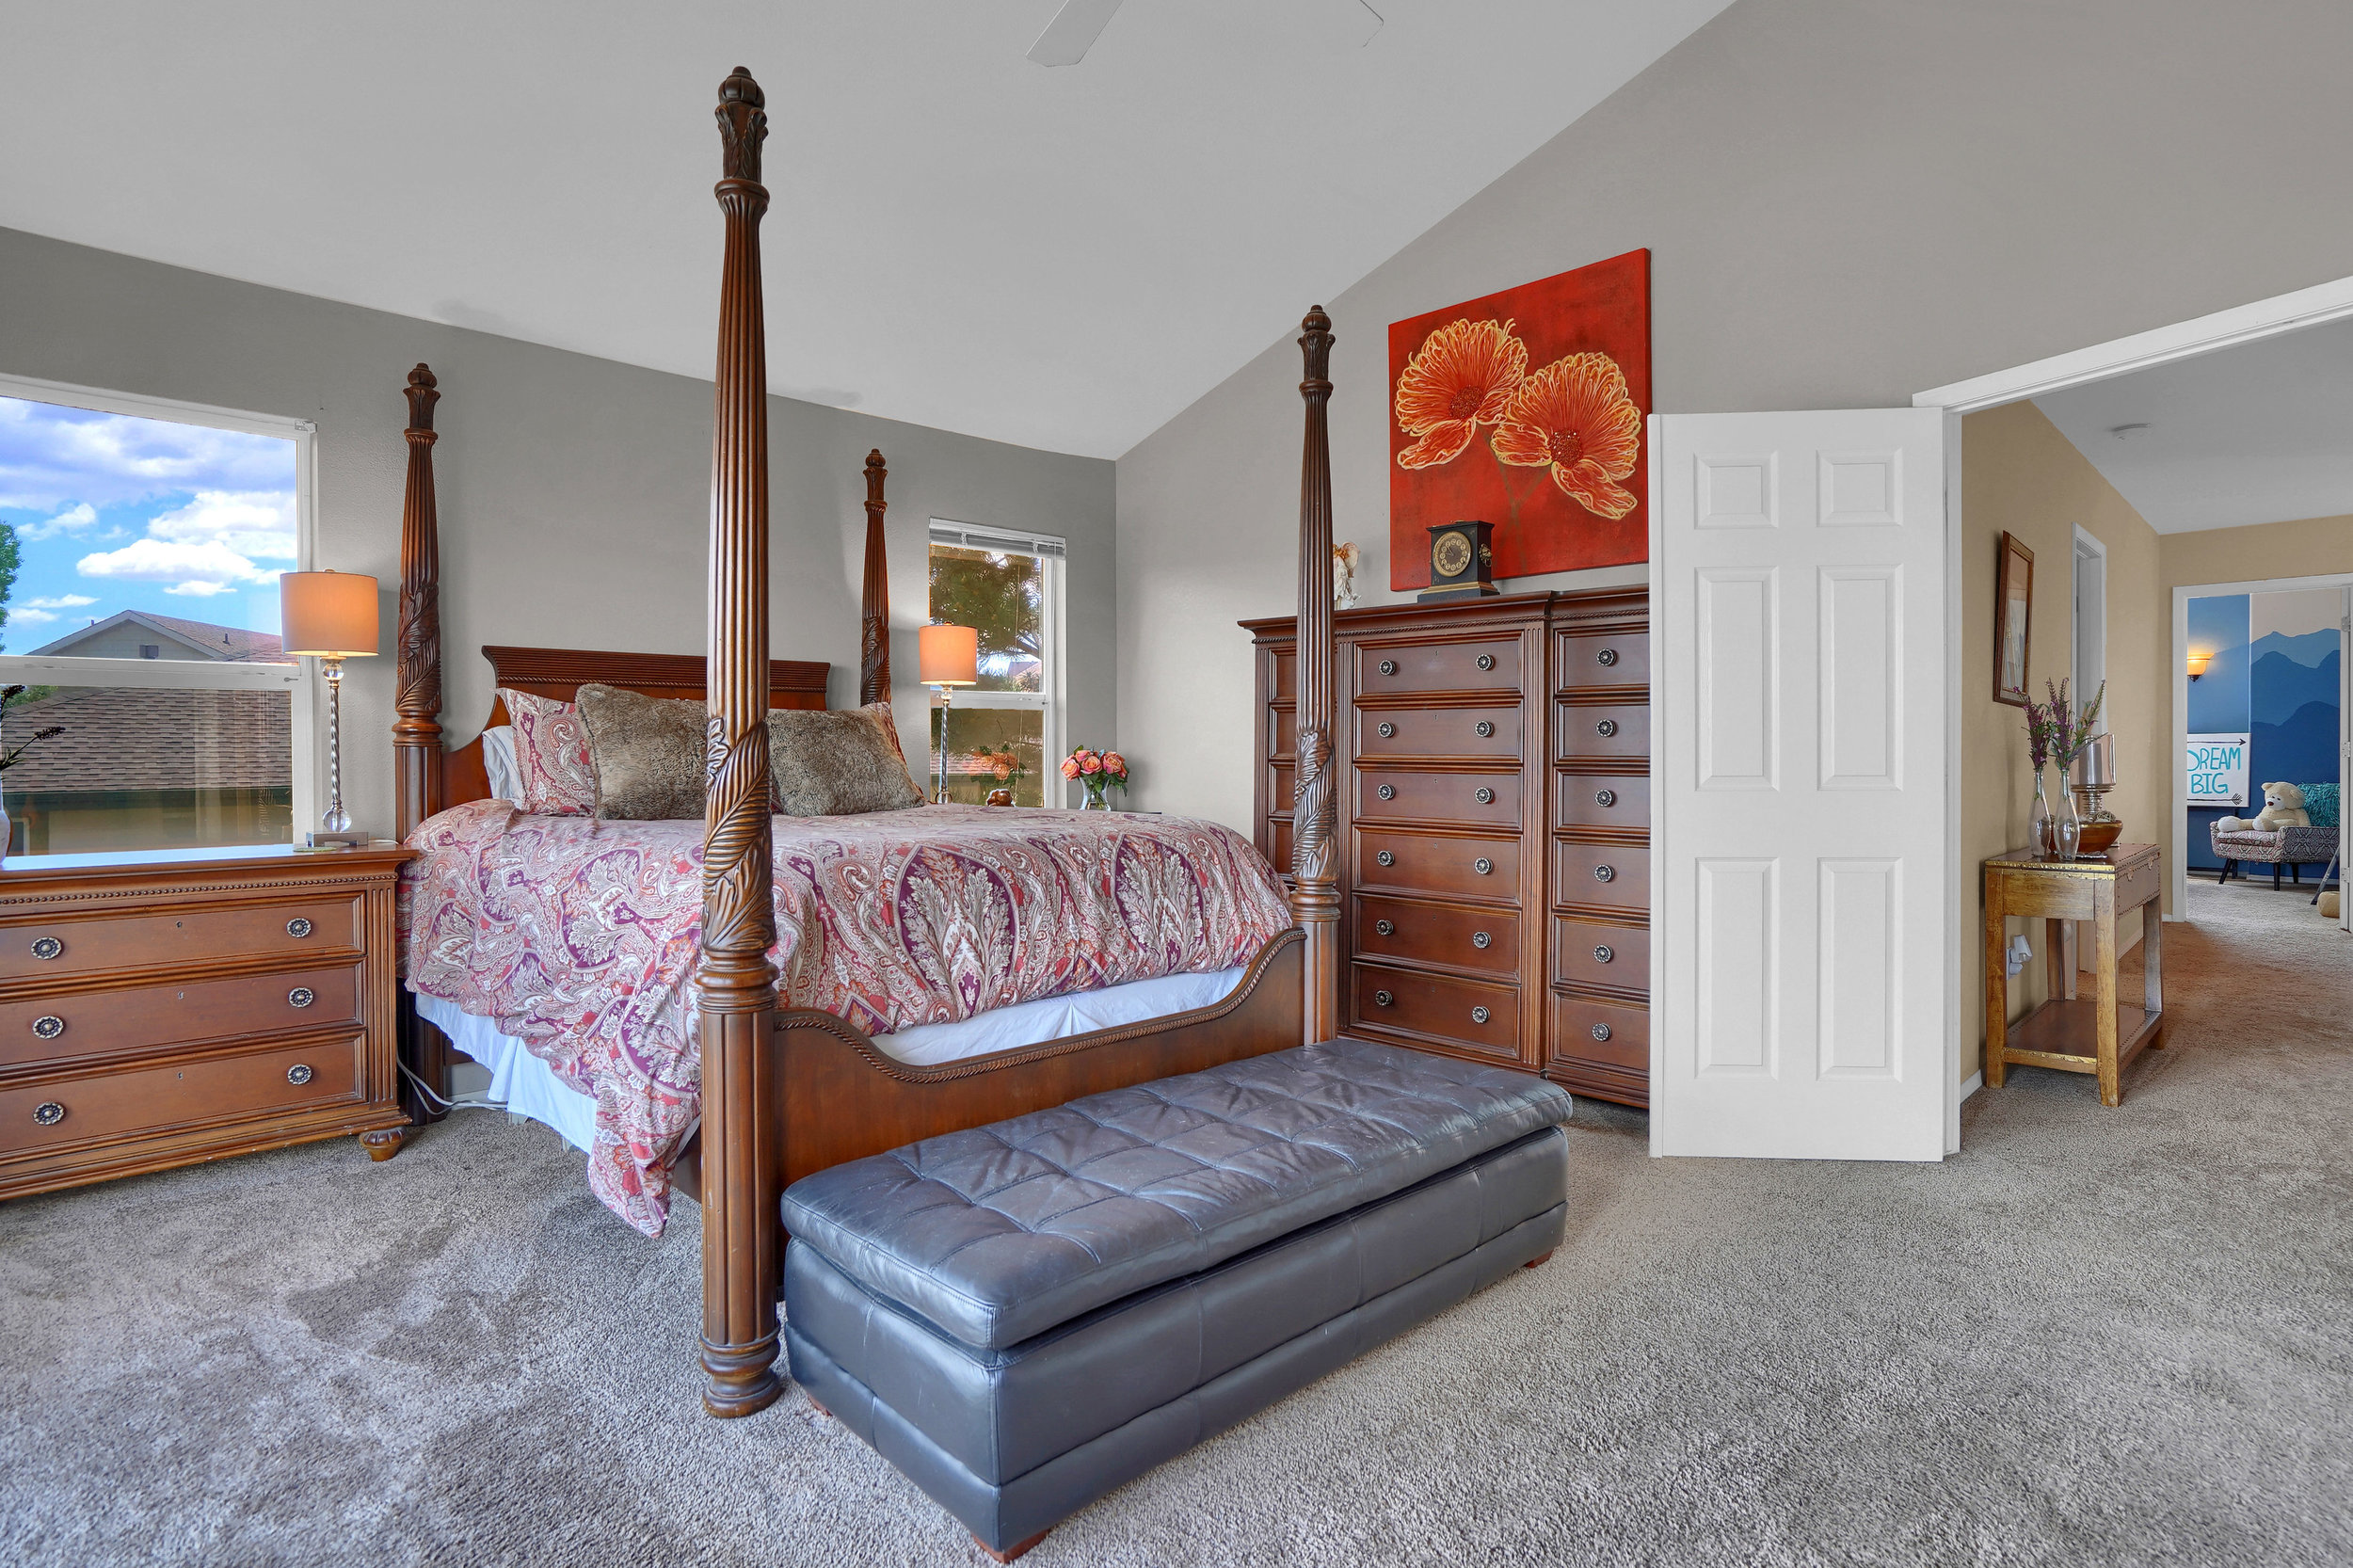 2756 Kittyhawk Road Colorado-print-023-011-Bedroom-3934x2622-300dpi.jpg